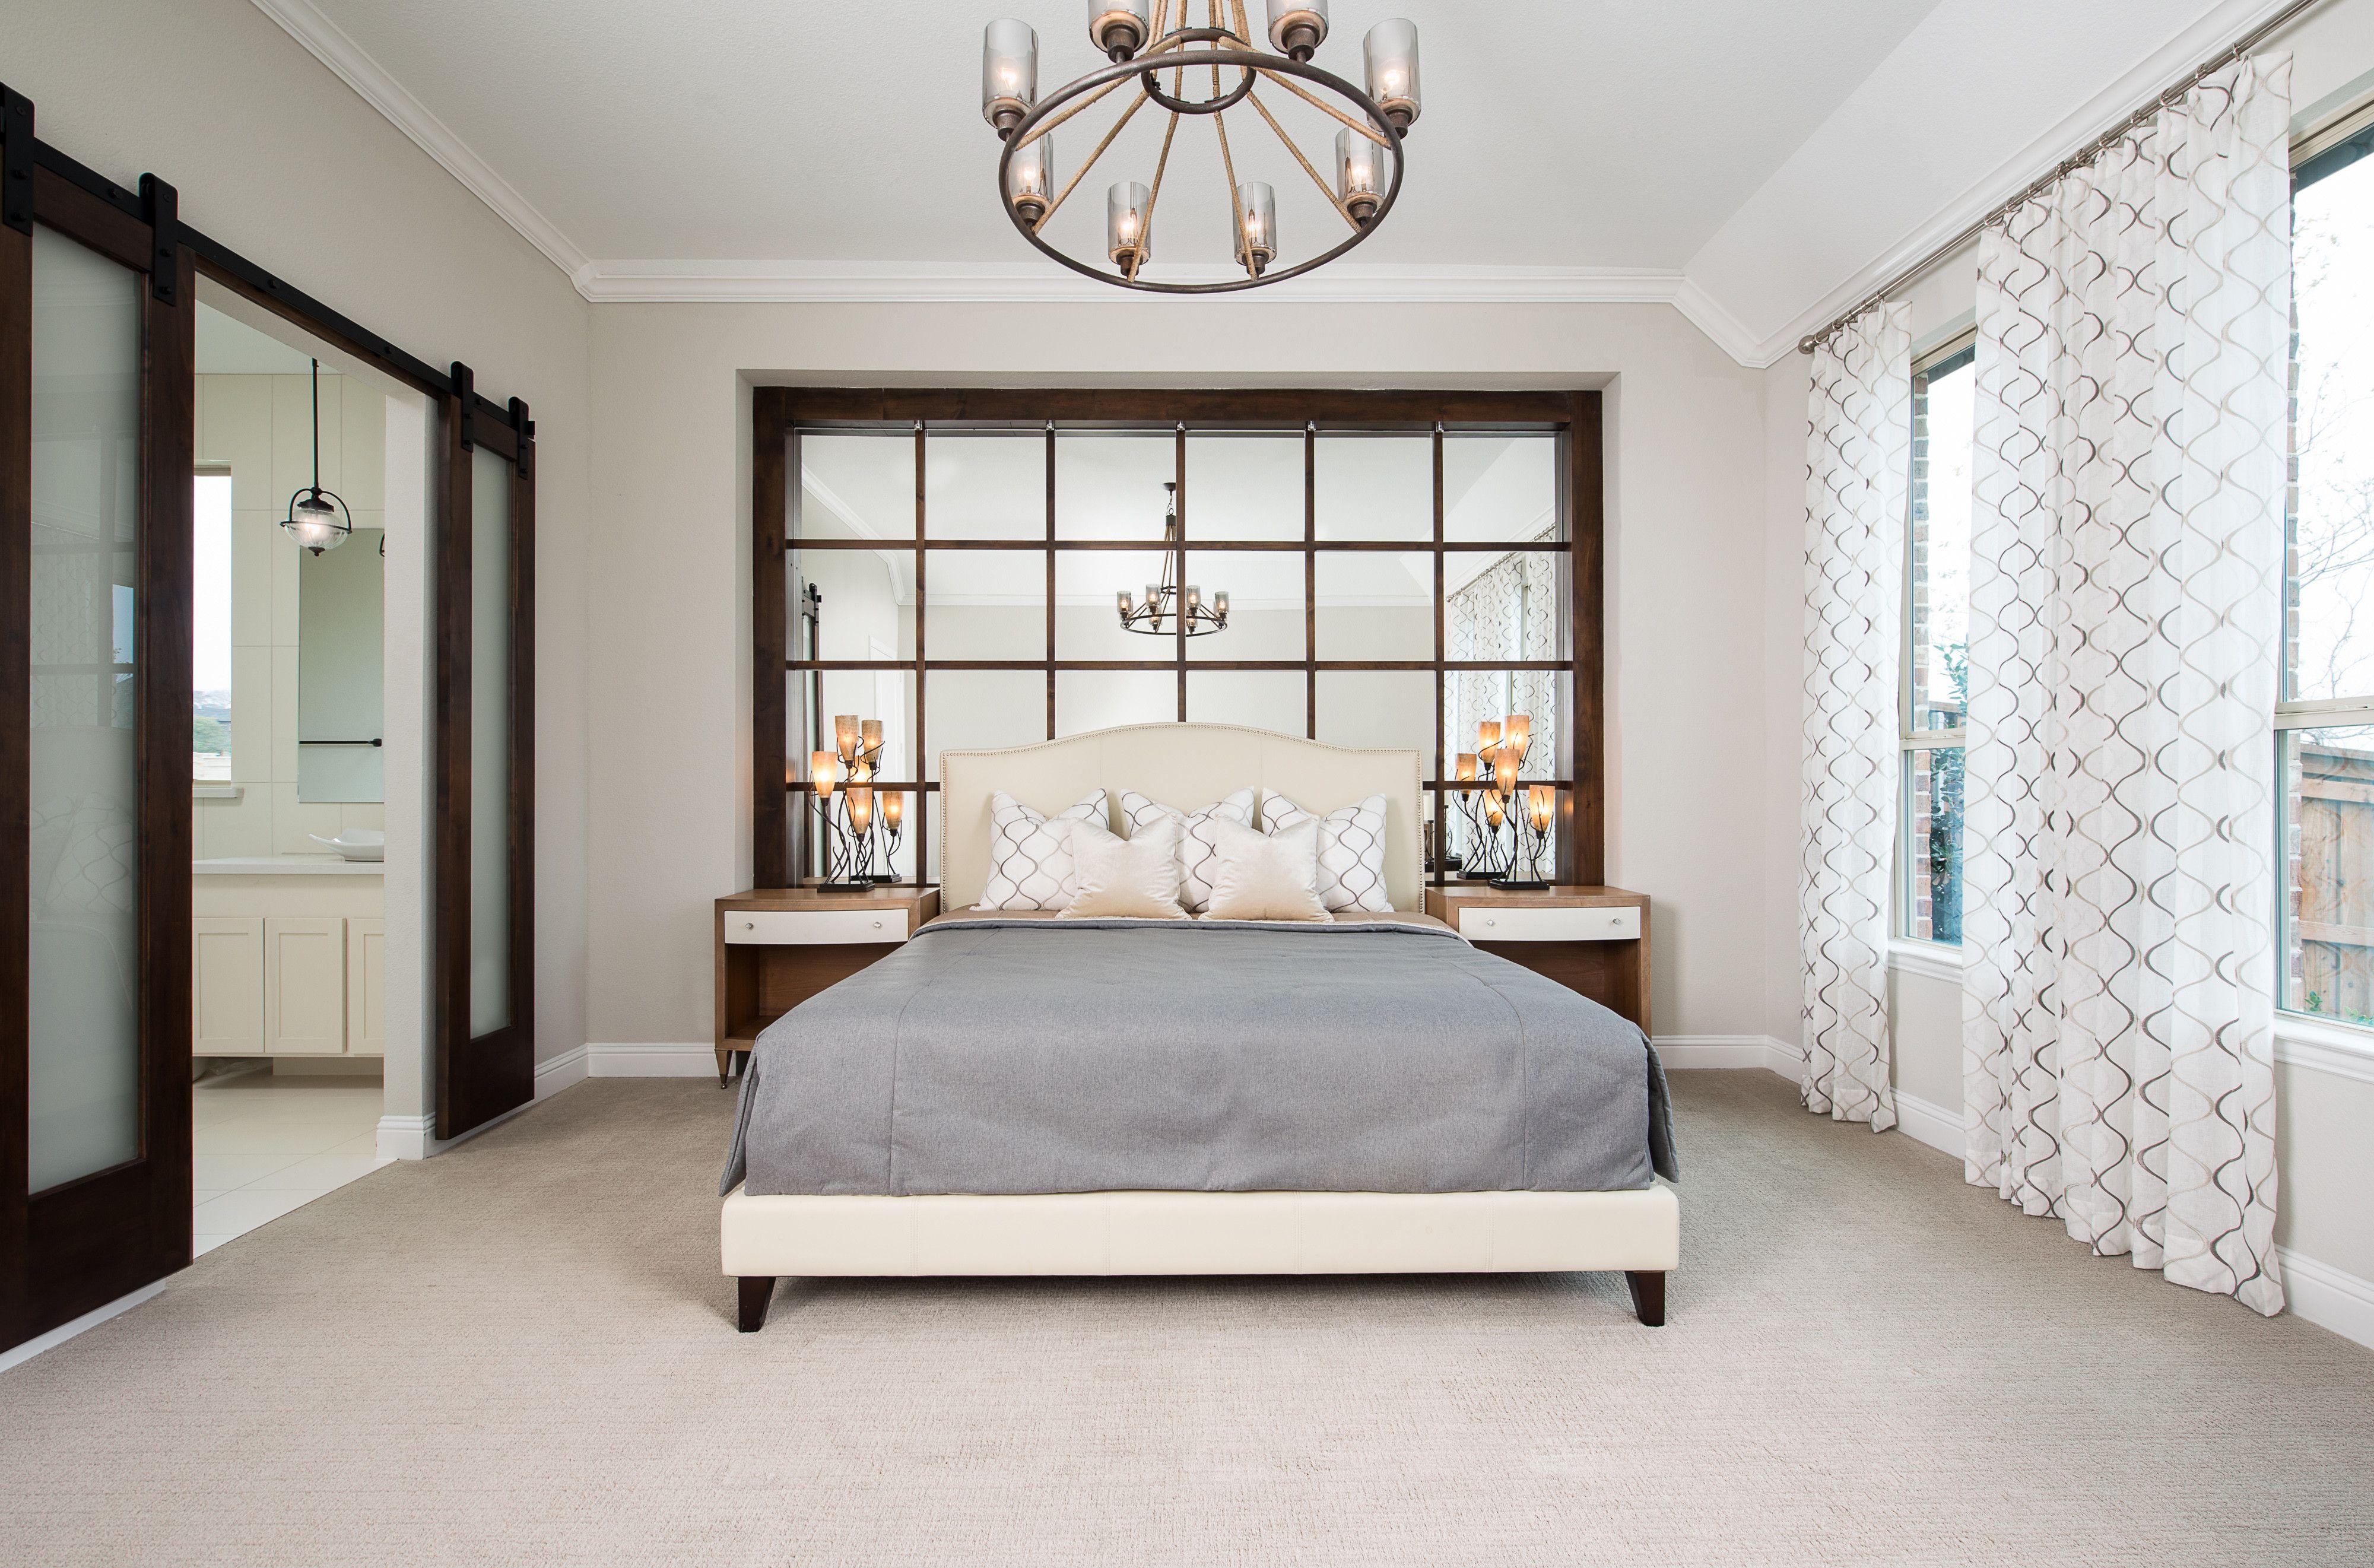 Bedroom-in-Shelton-at-The Parks at Legacy-in-Prosper